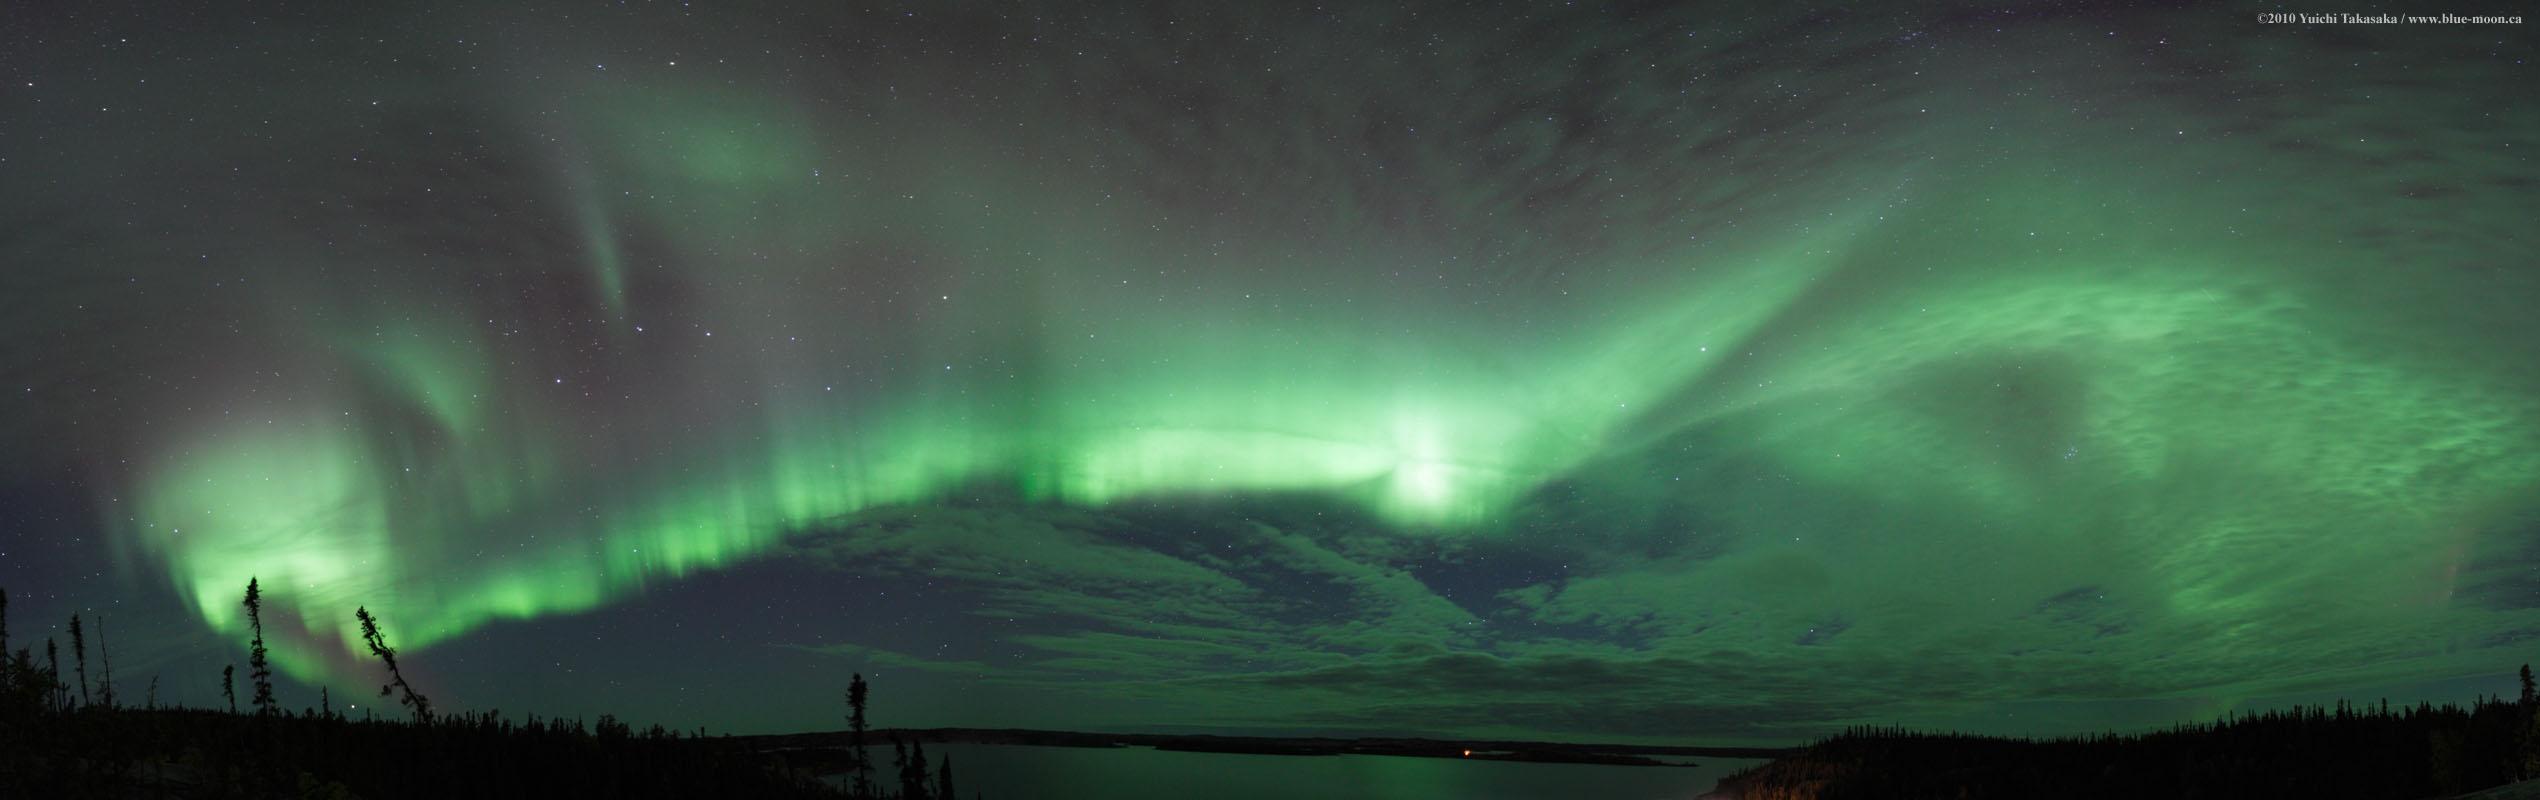 APOD: 2010 September 17 - Northern Lights over Prelude Lake